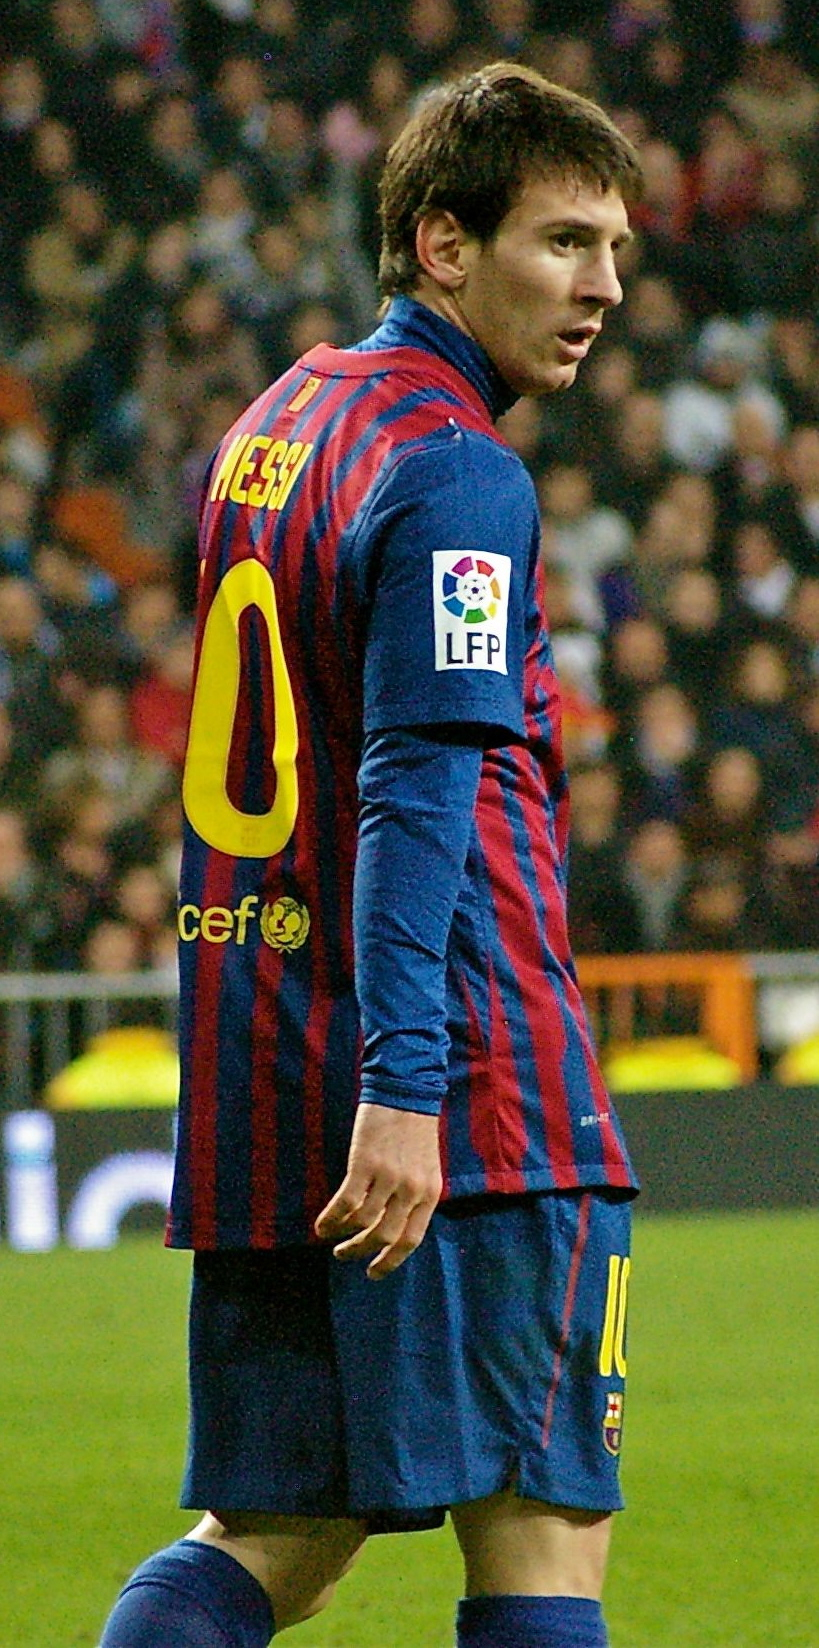 Messi 2014 Clasico Messi Durante un Clásico